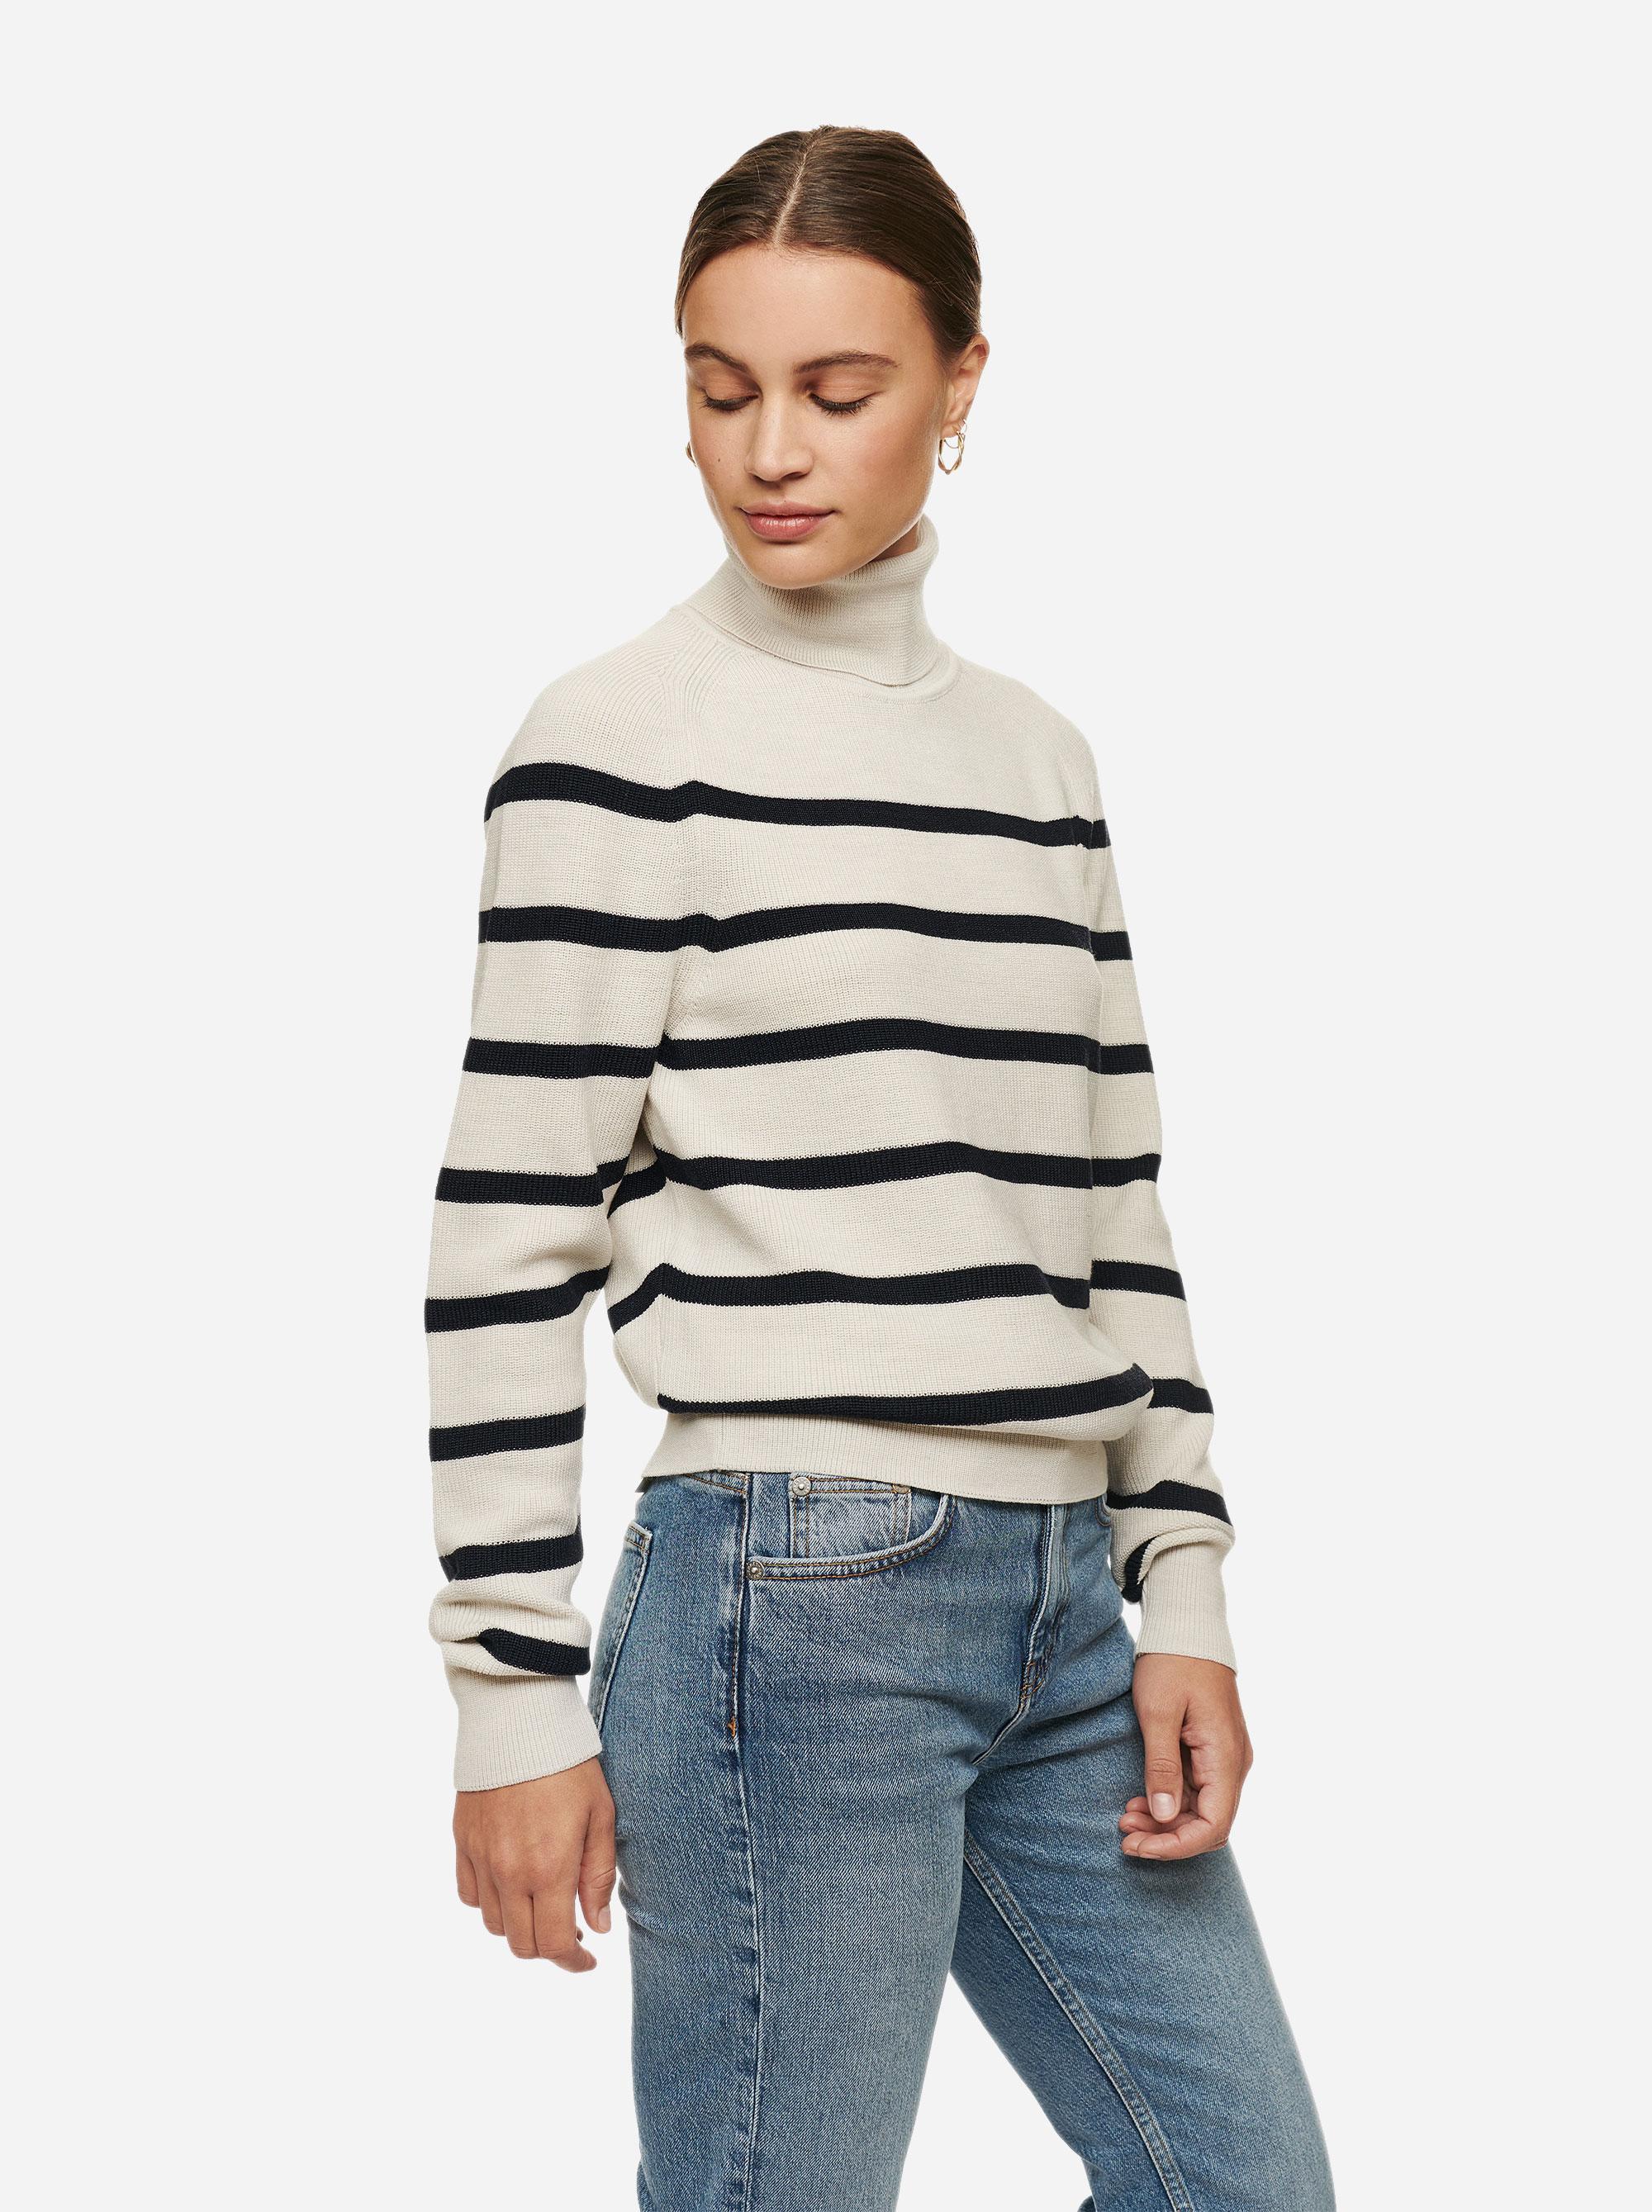 Teym - Turtleneck - The Merino Sweater - Men - Striped - 1